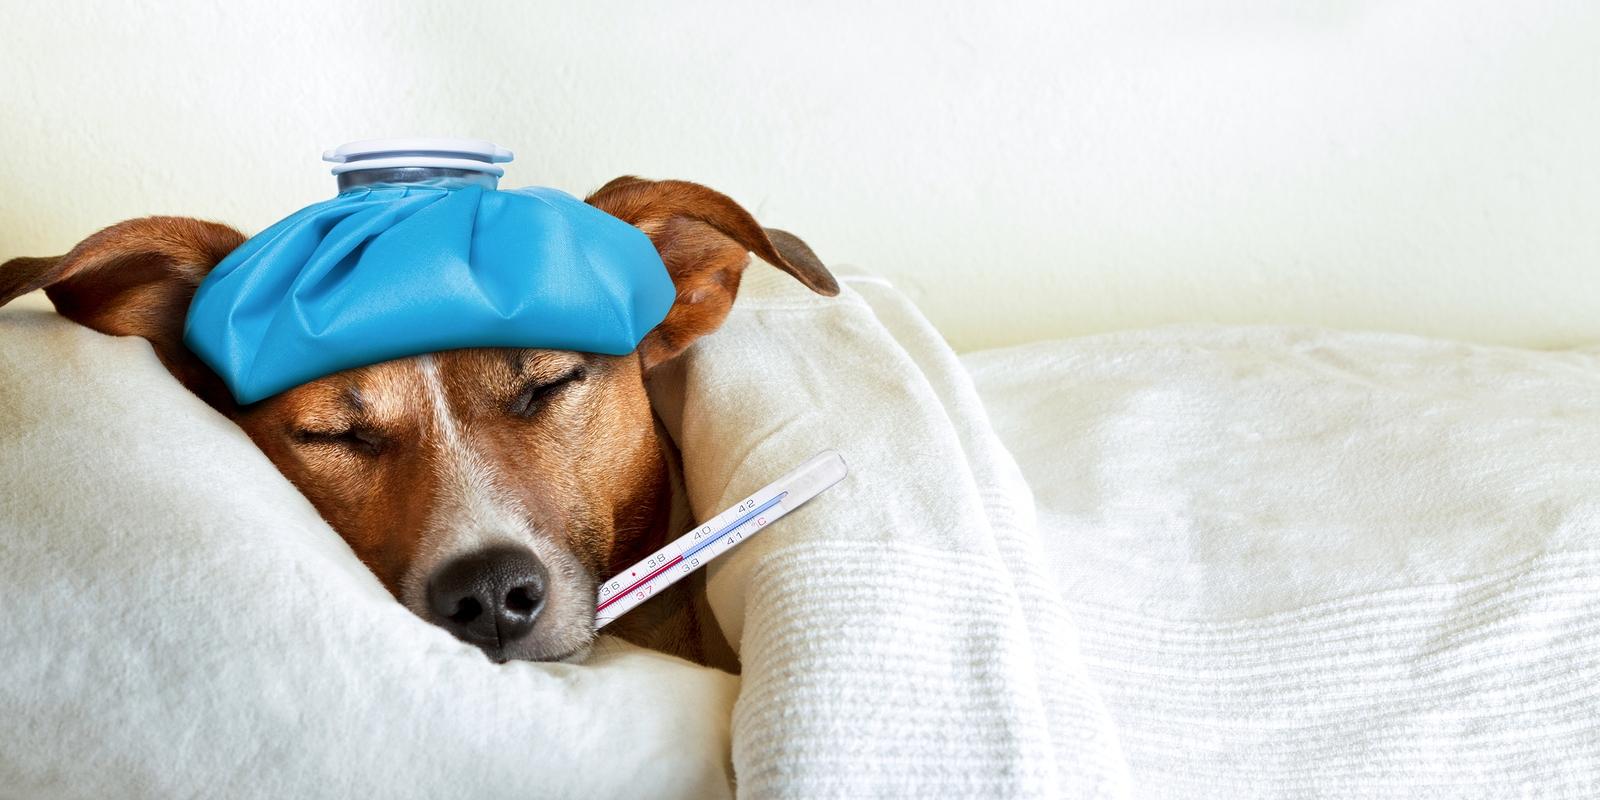 bigstock-Sick-Ill-Dog-90002564